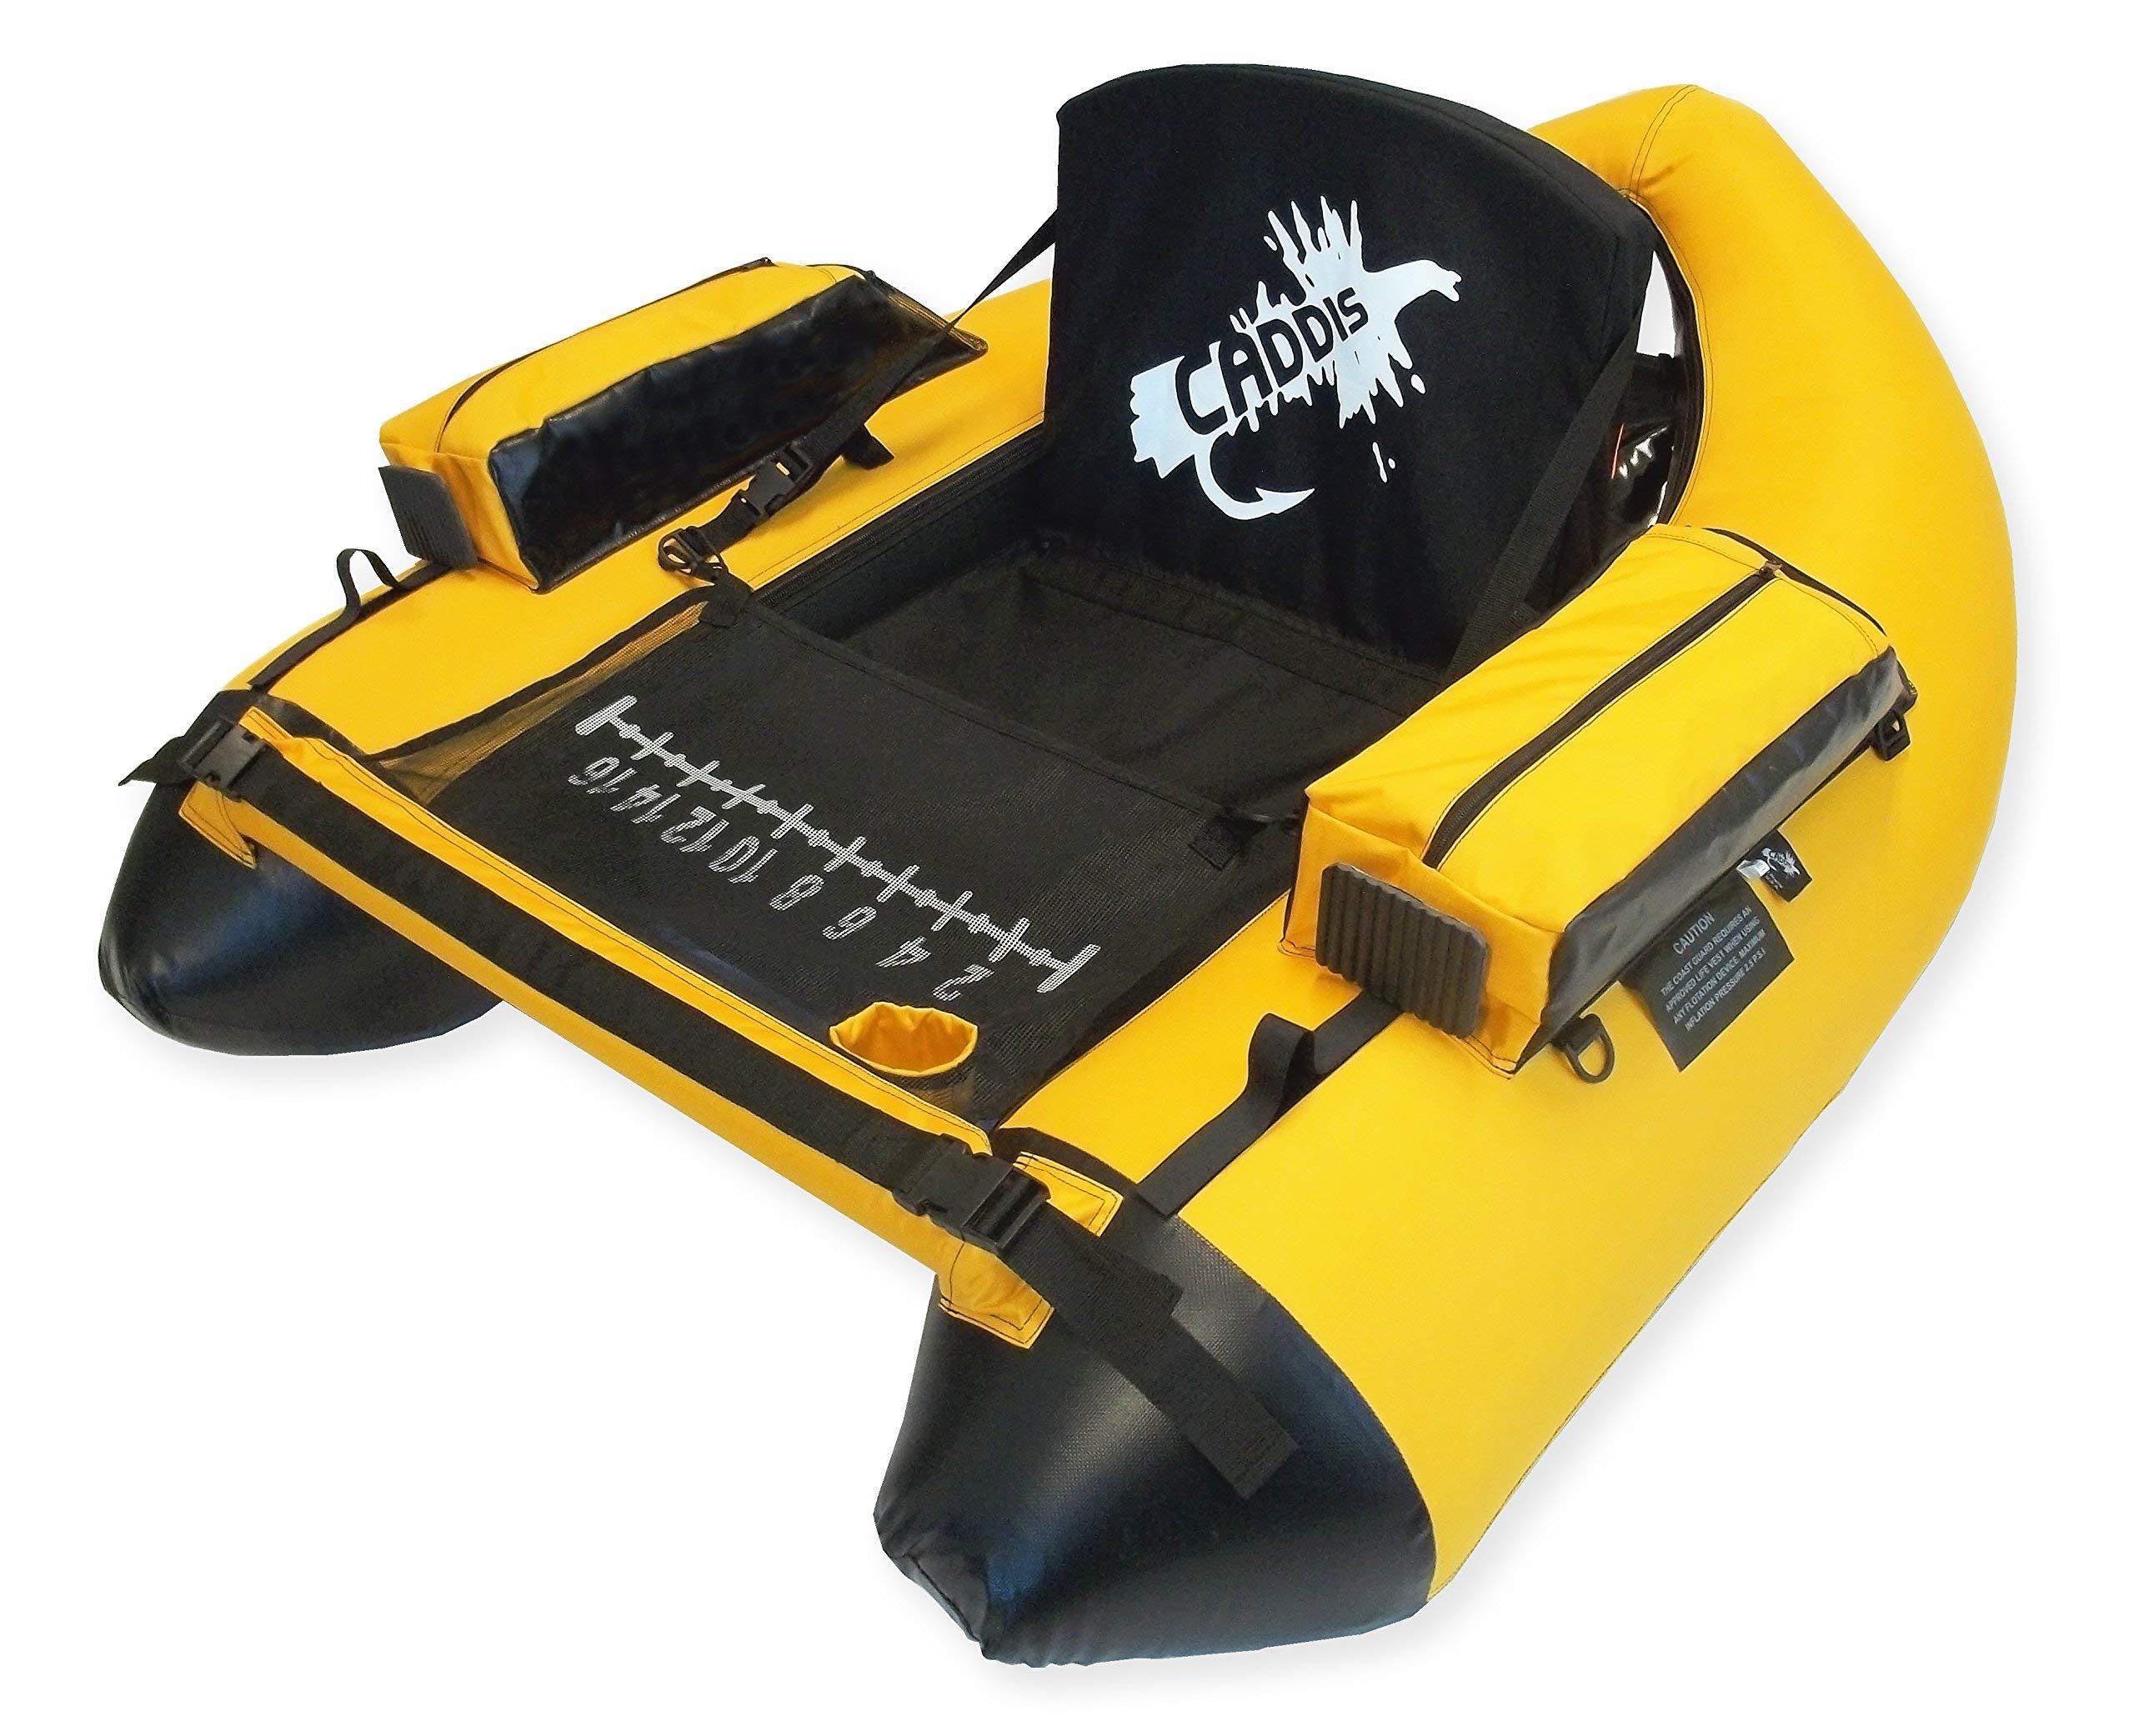 Caddis Sports Premier Plus Float Tube, Yellow (Renewed)